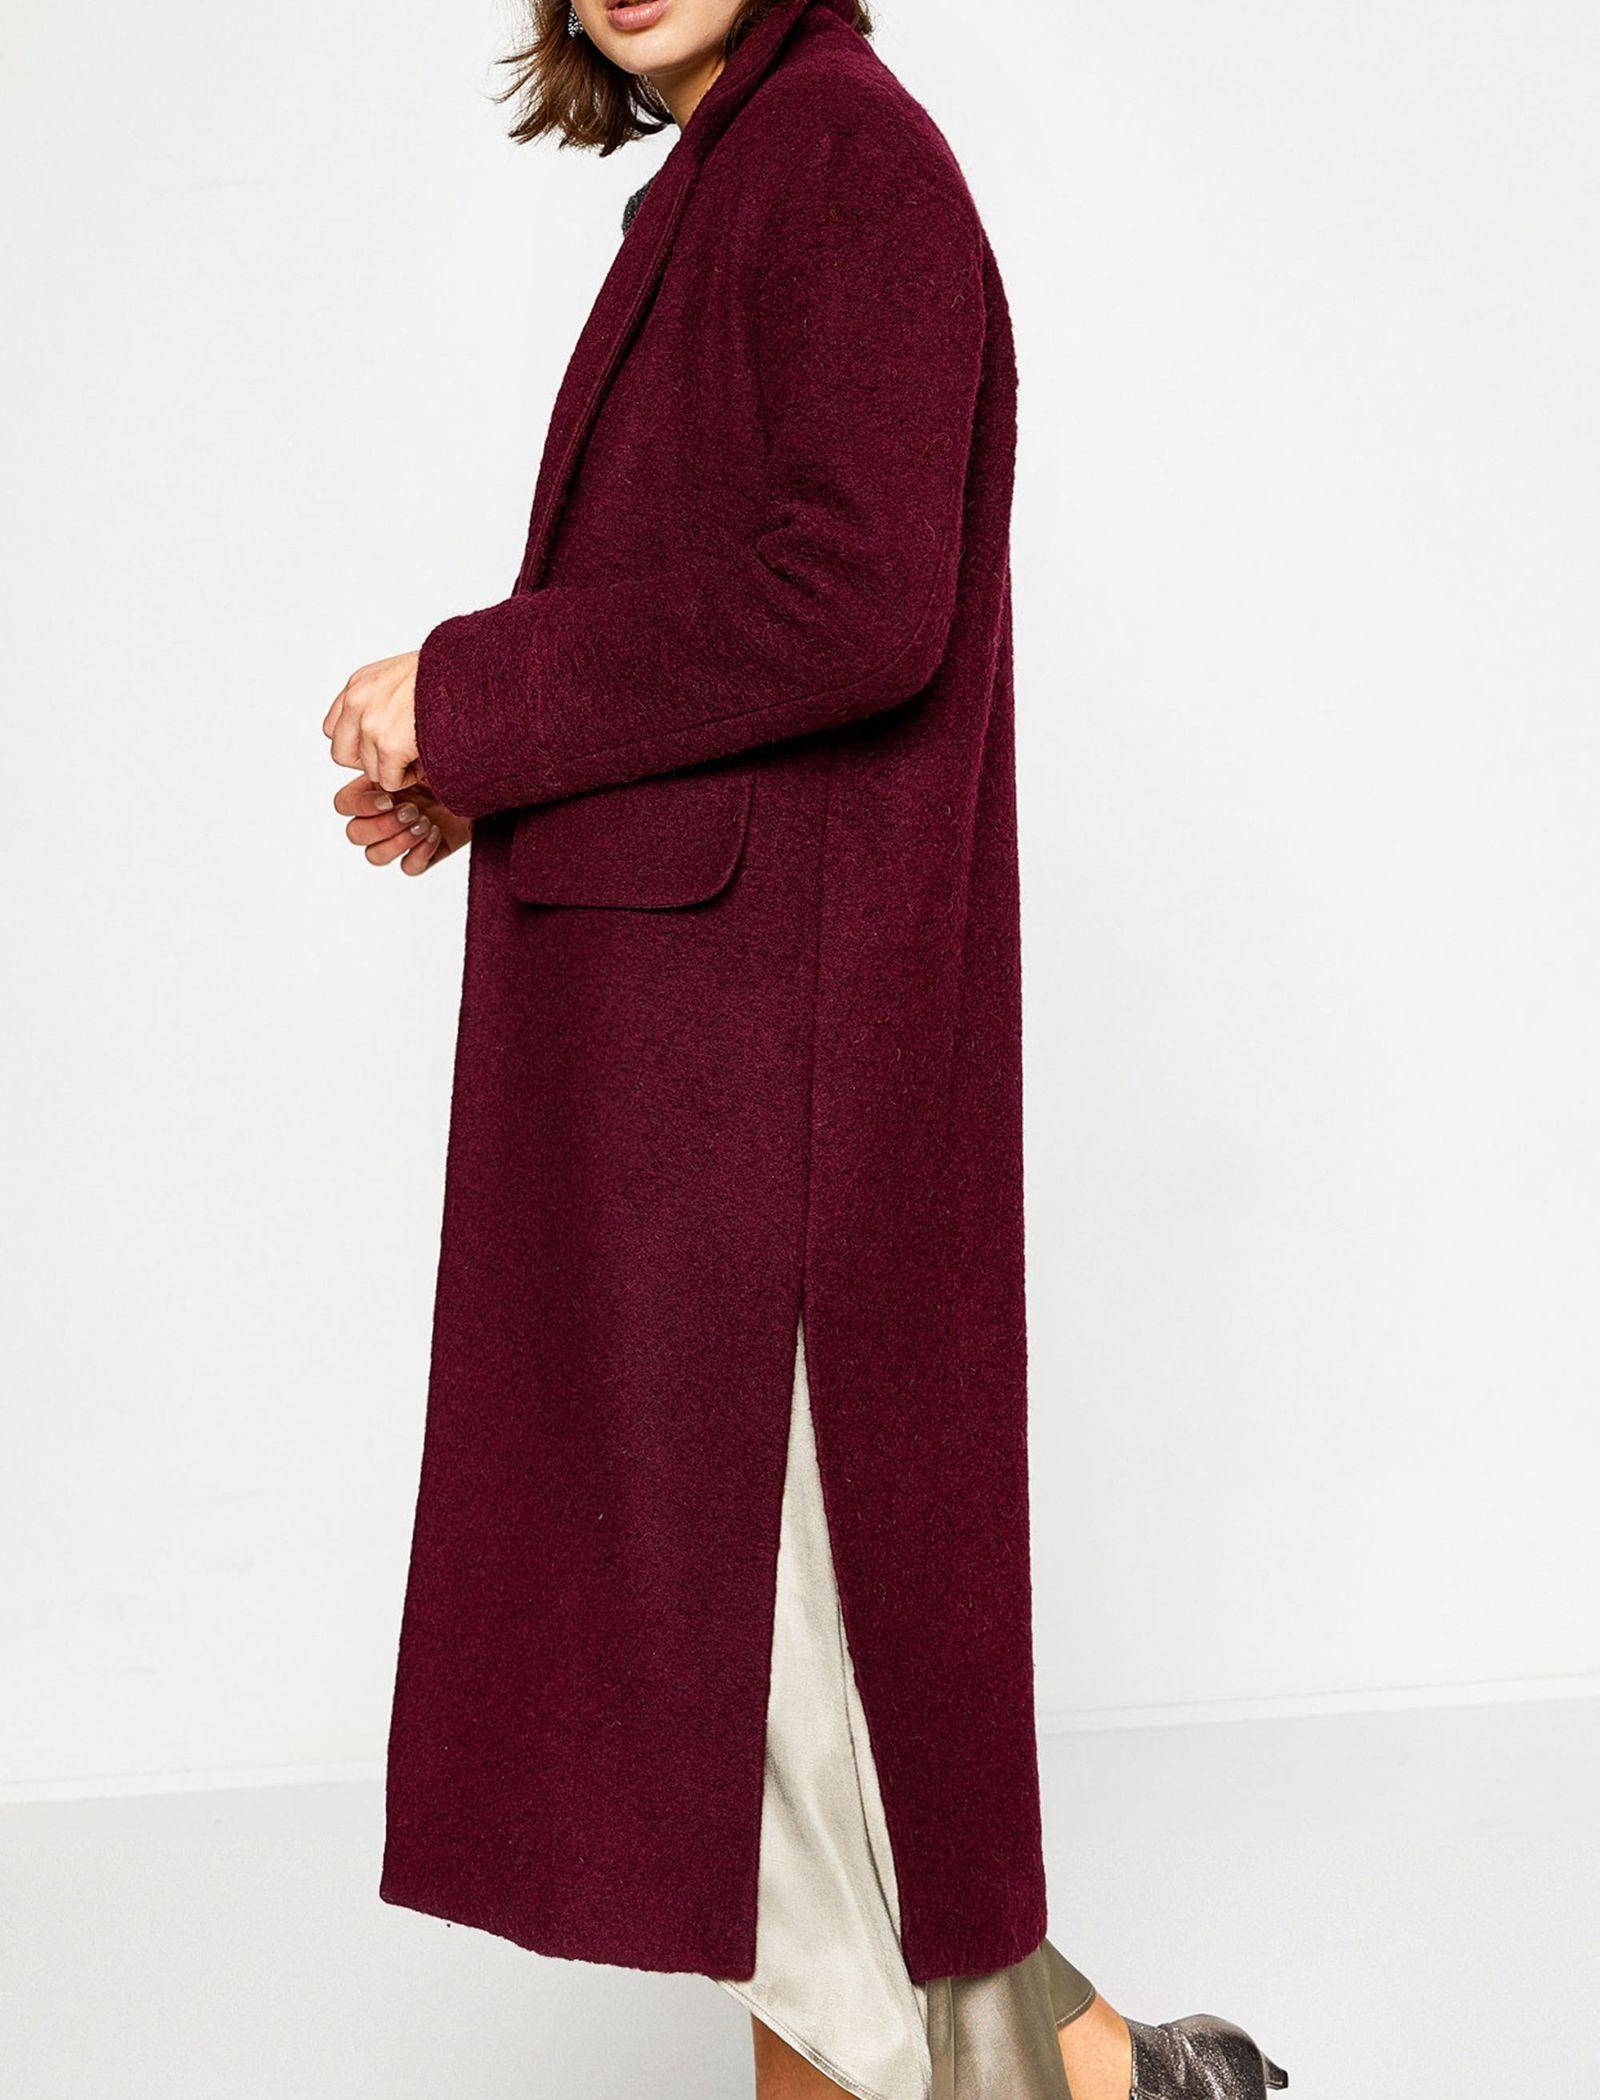 پالتو پشمی بلند زنانه - کوتون - زرشکي - 3